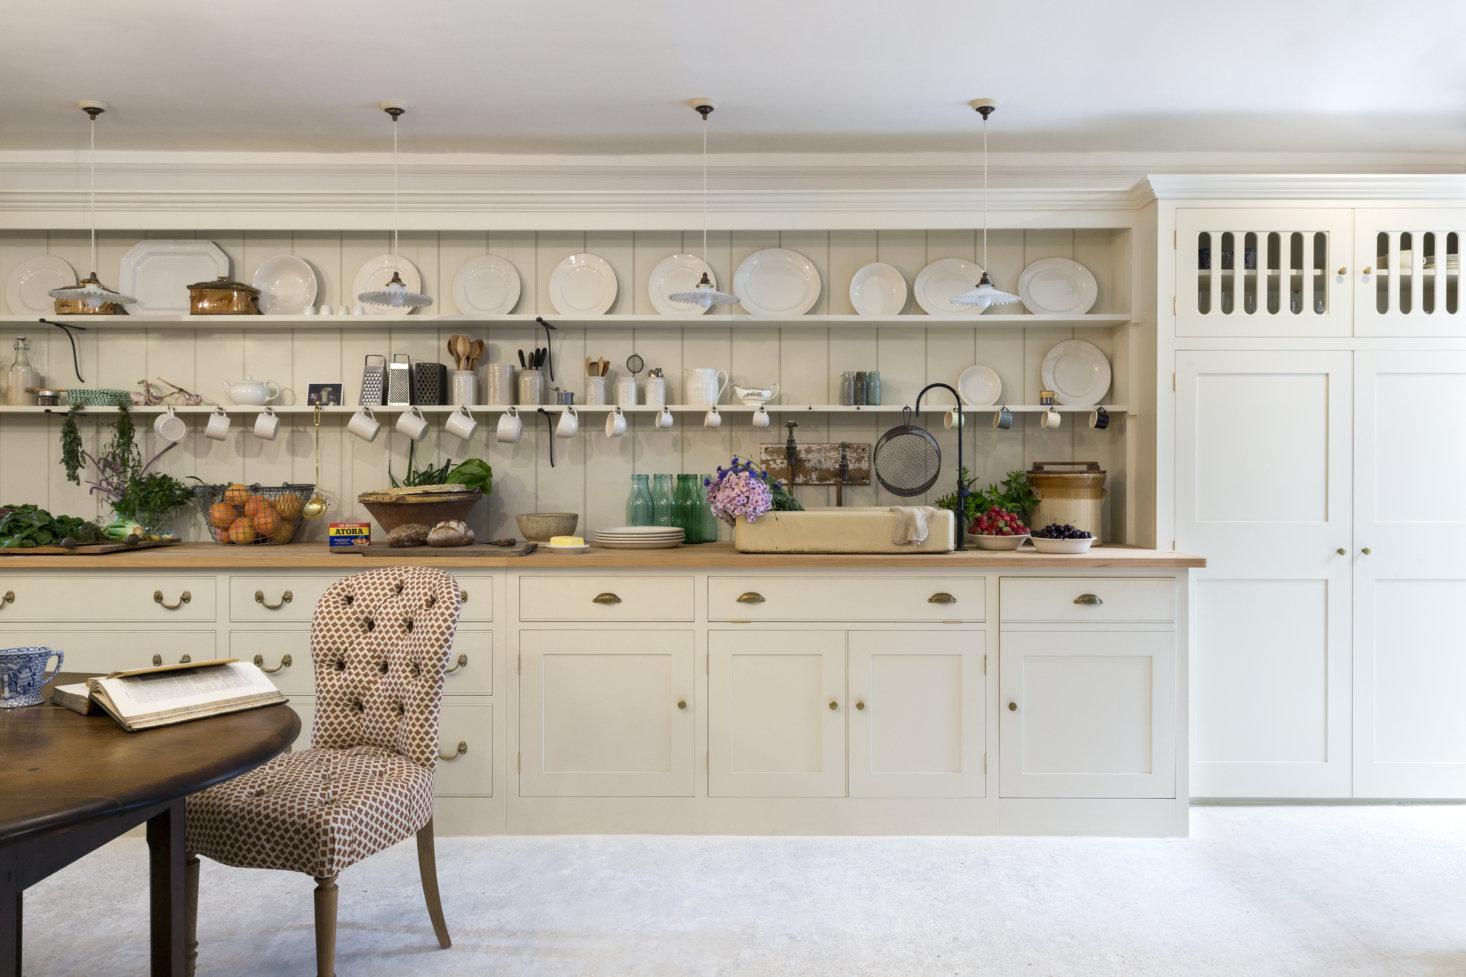 plain-english-kitchen-at-howe-london-2-1466x977.jpg